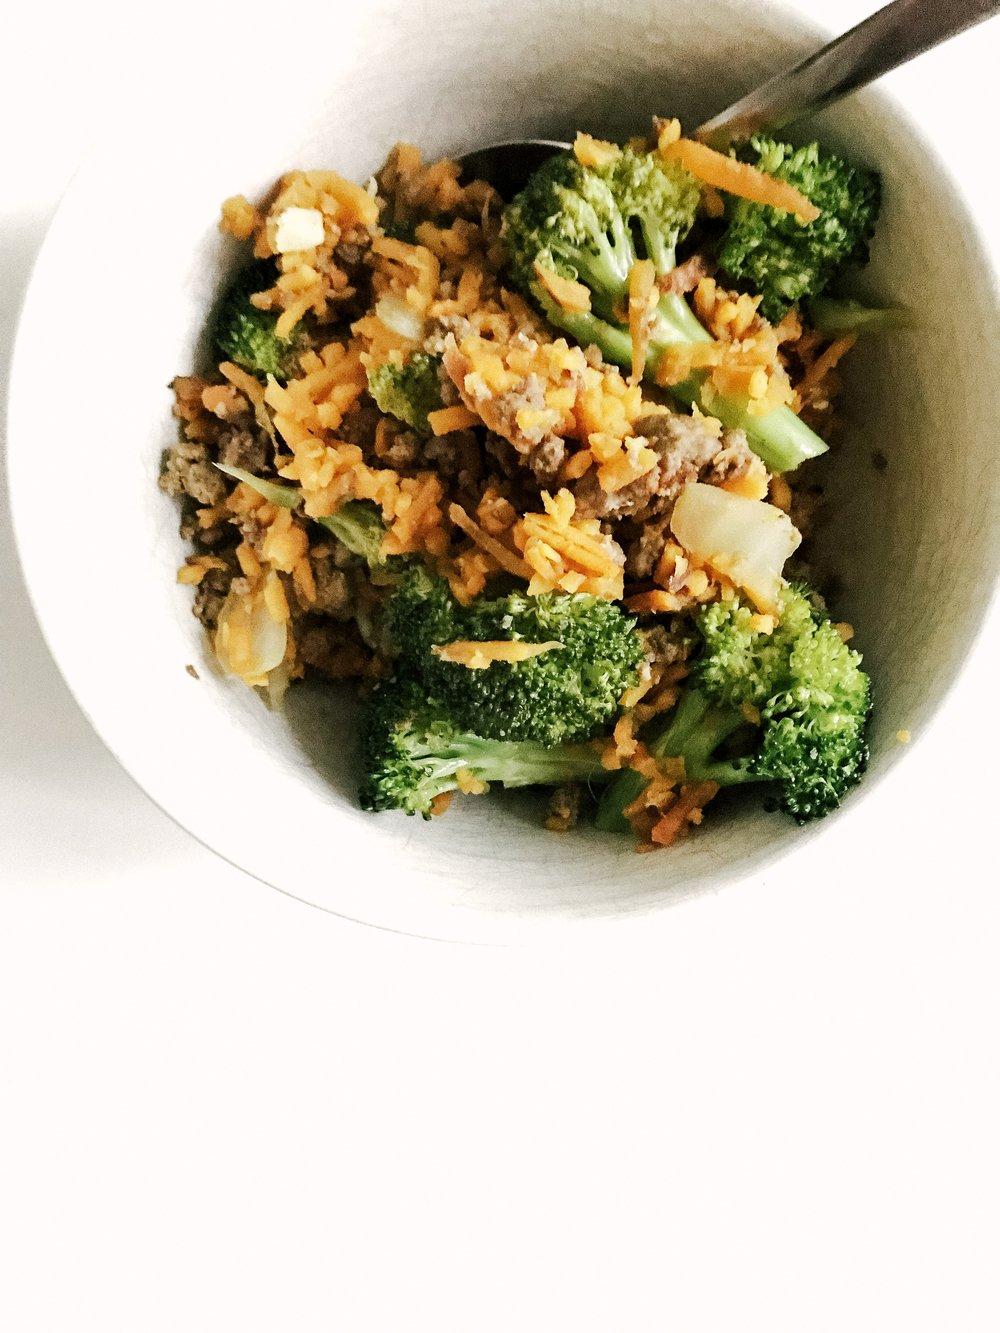 beef, broccoli & sweet potato bowl (30-minute meals)